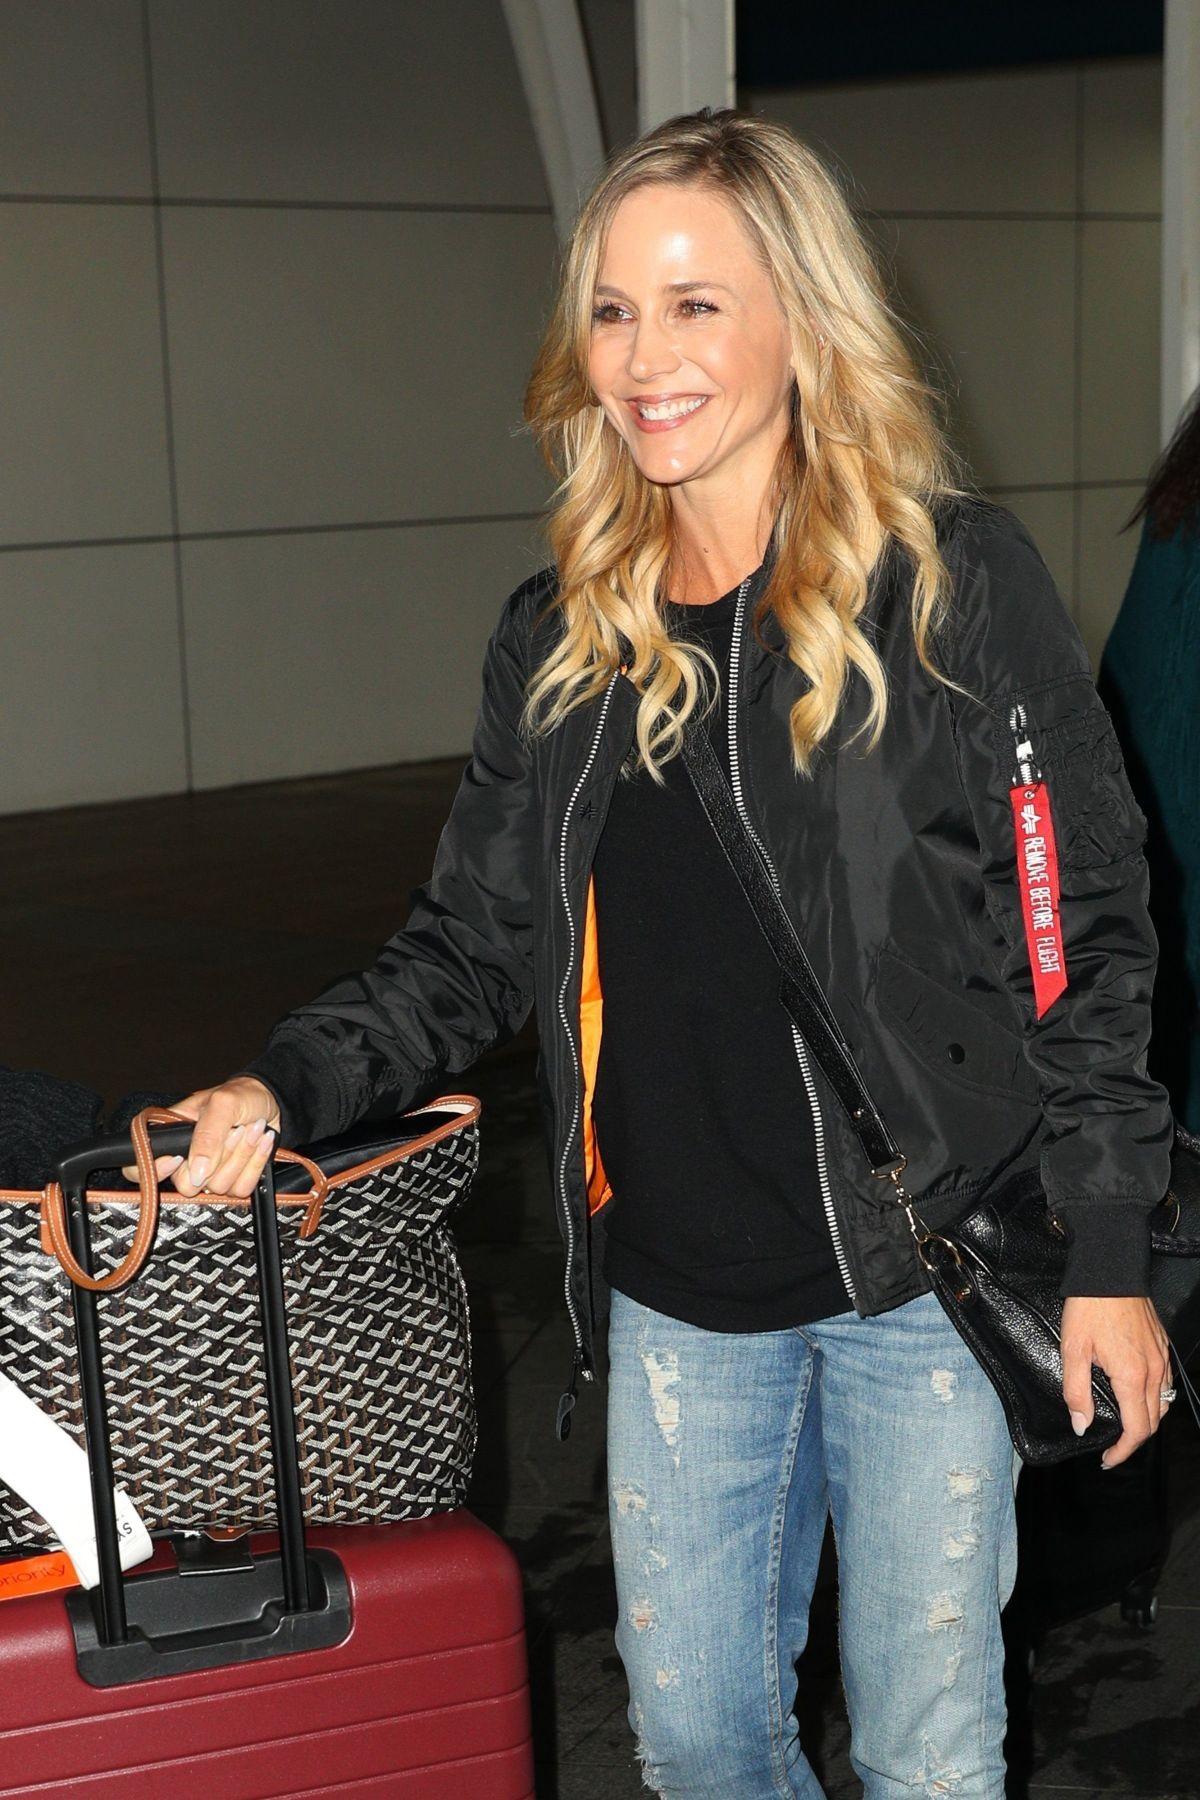 JULIE BENZ at Airport in Sydney 06/15/2017